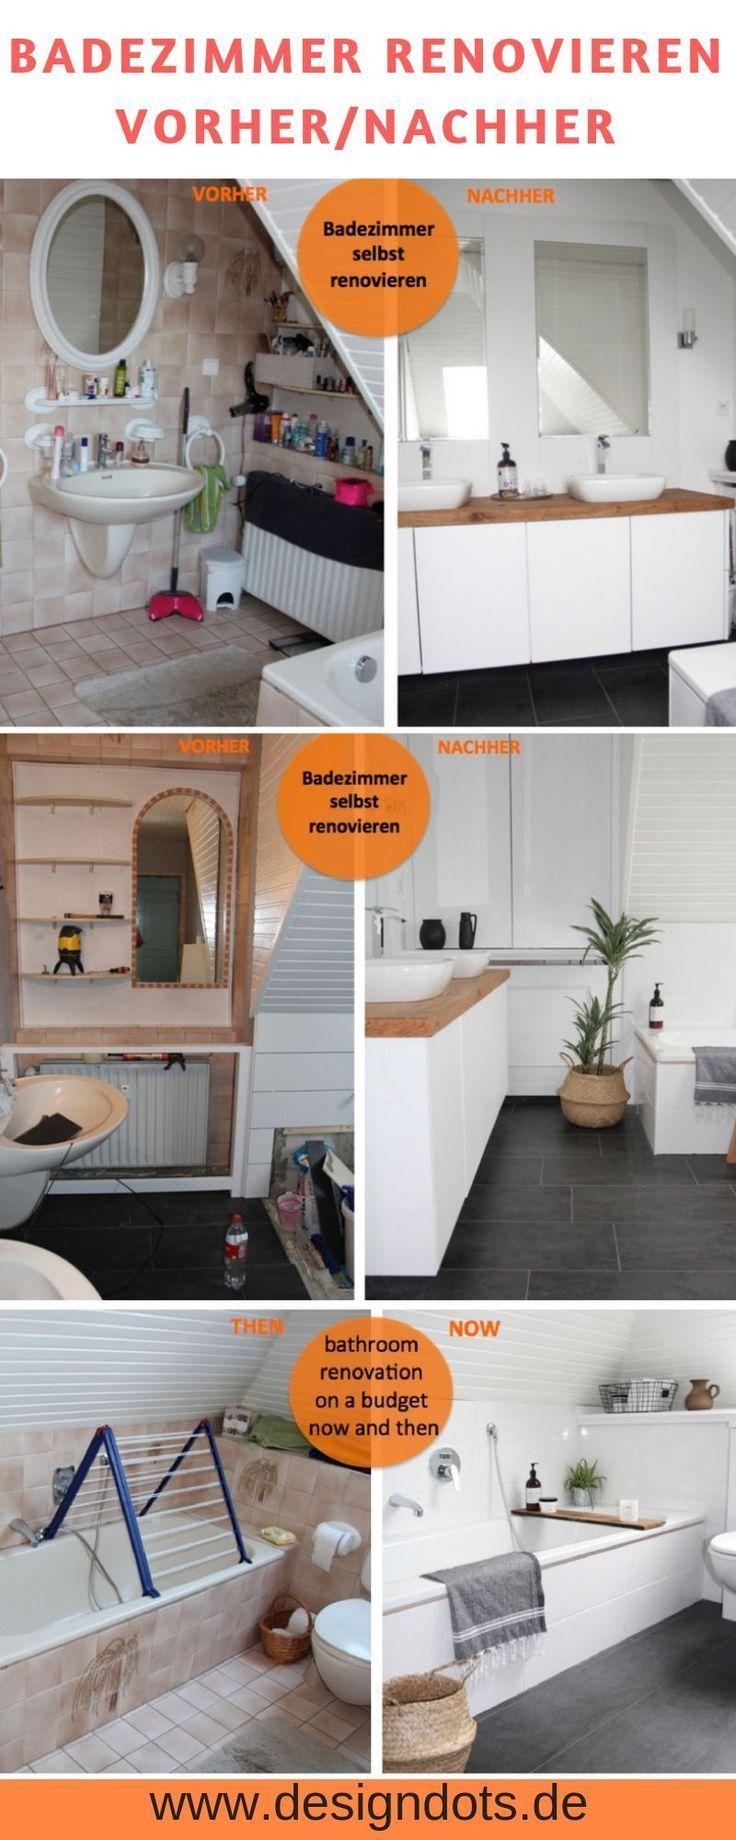 badezimmer selber renovieren